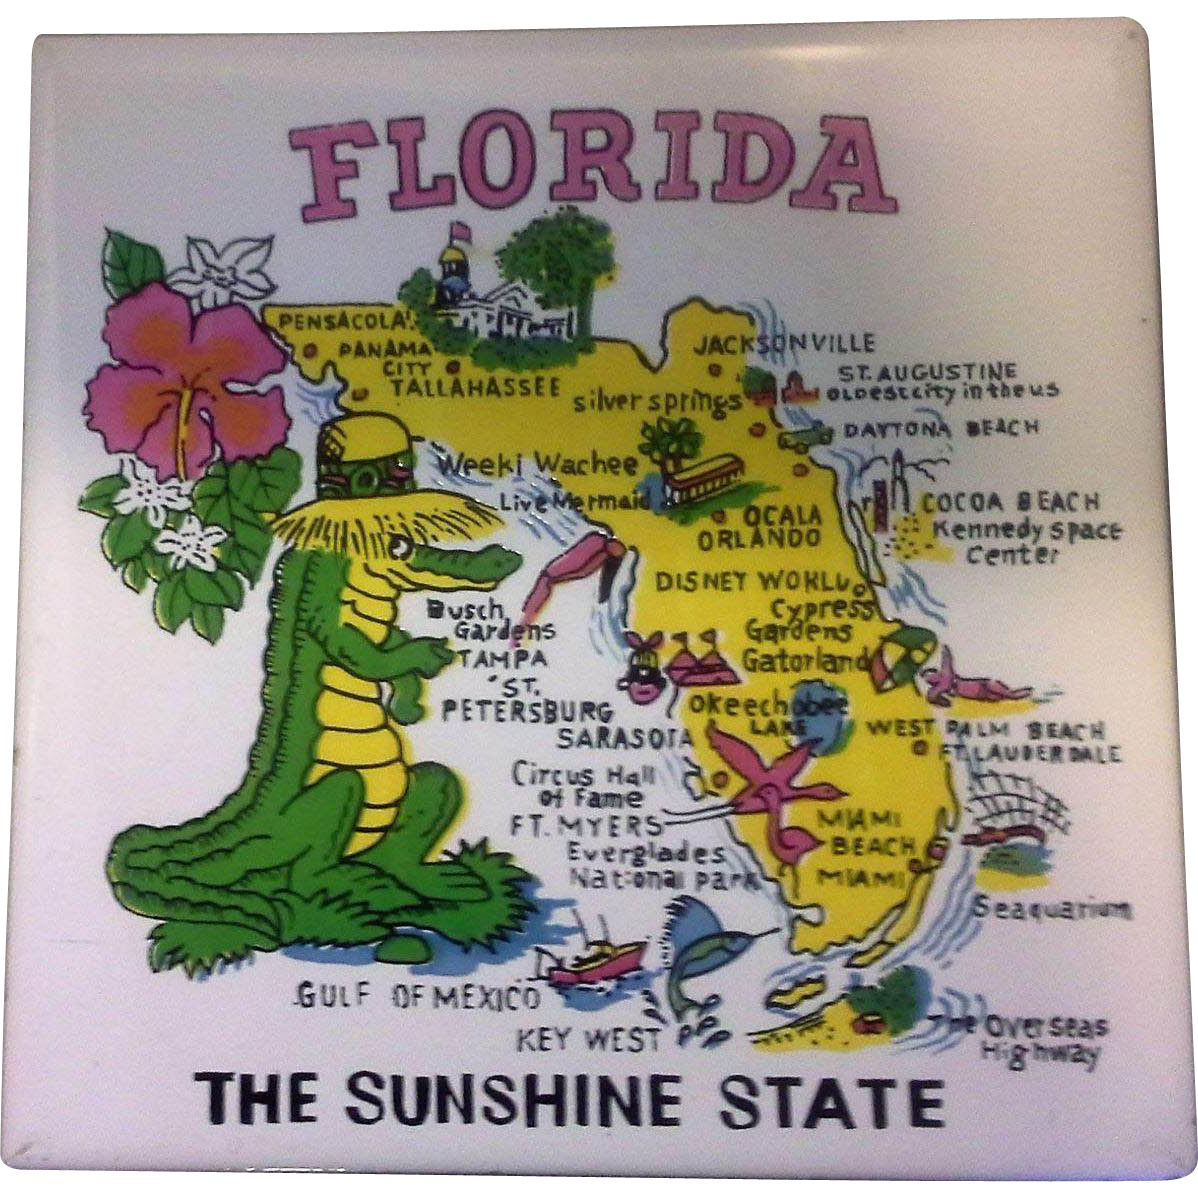 Florida map souvenir tile trivet ceramic made in philippines from florida map souvenir tile trivet ceramic made in philippines dailygadgetfo Images